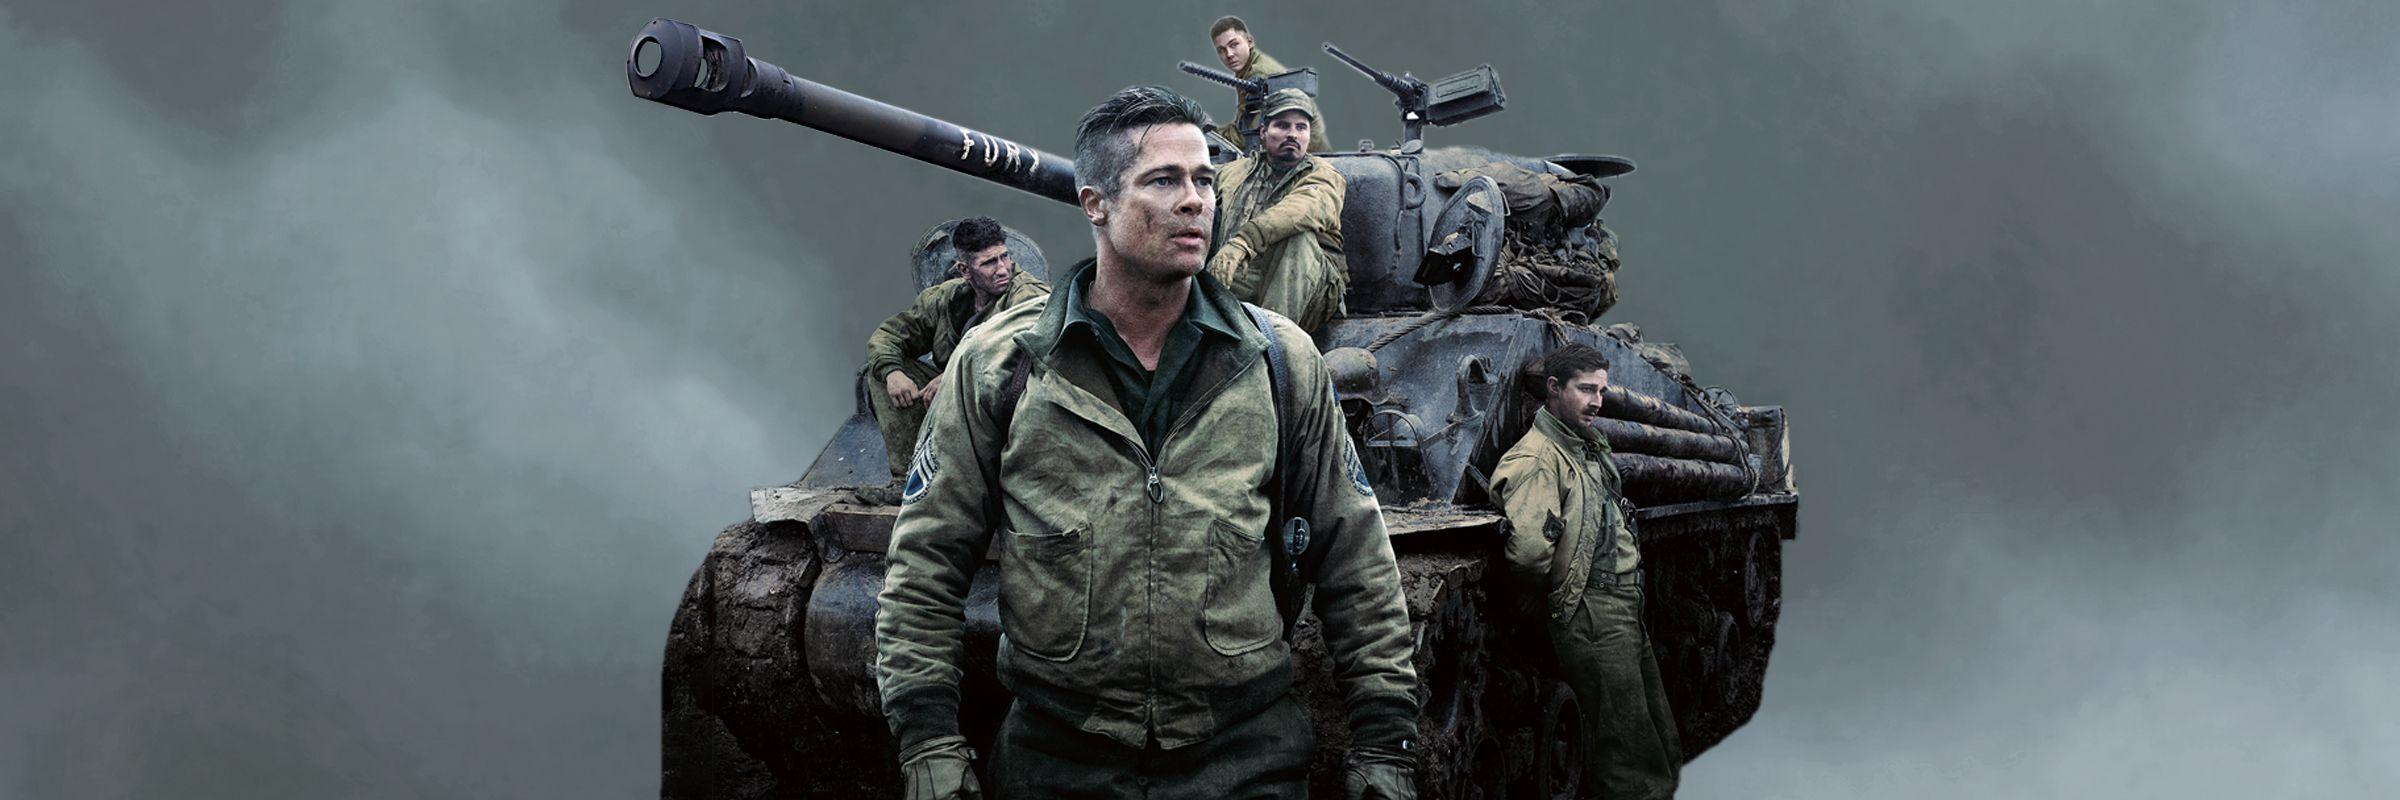 Fury | Full Movie | Movies Anywhere